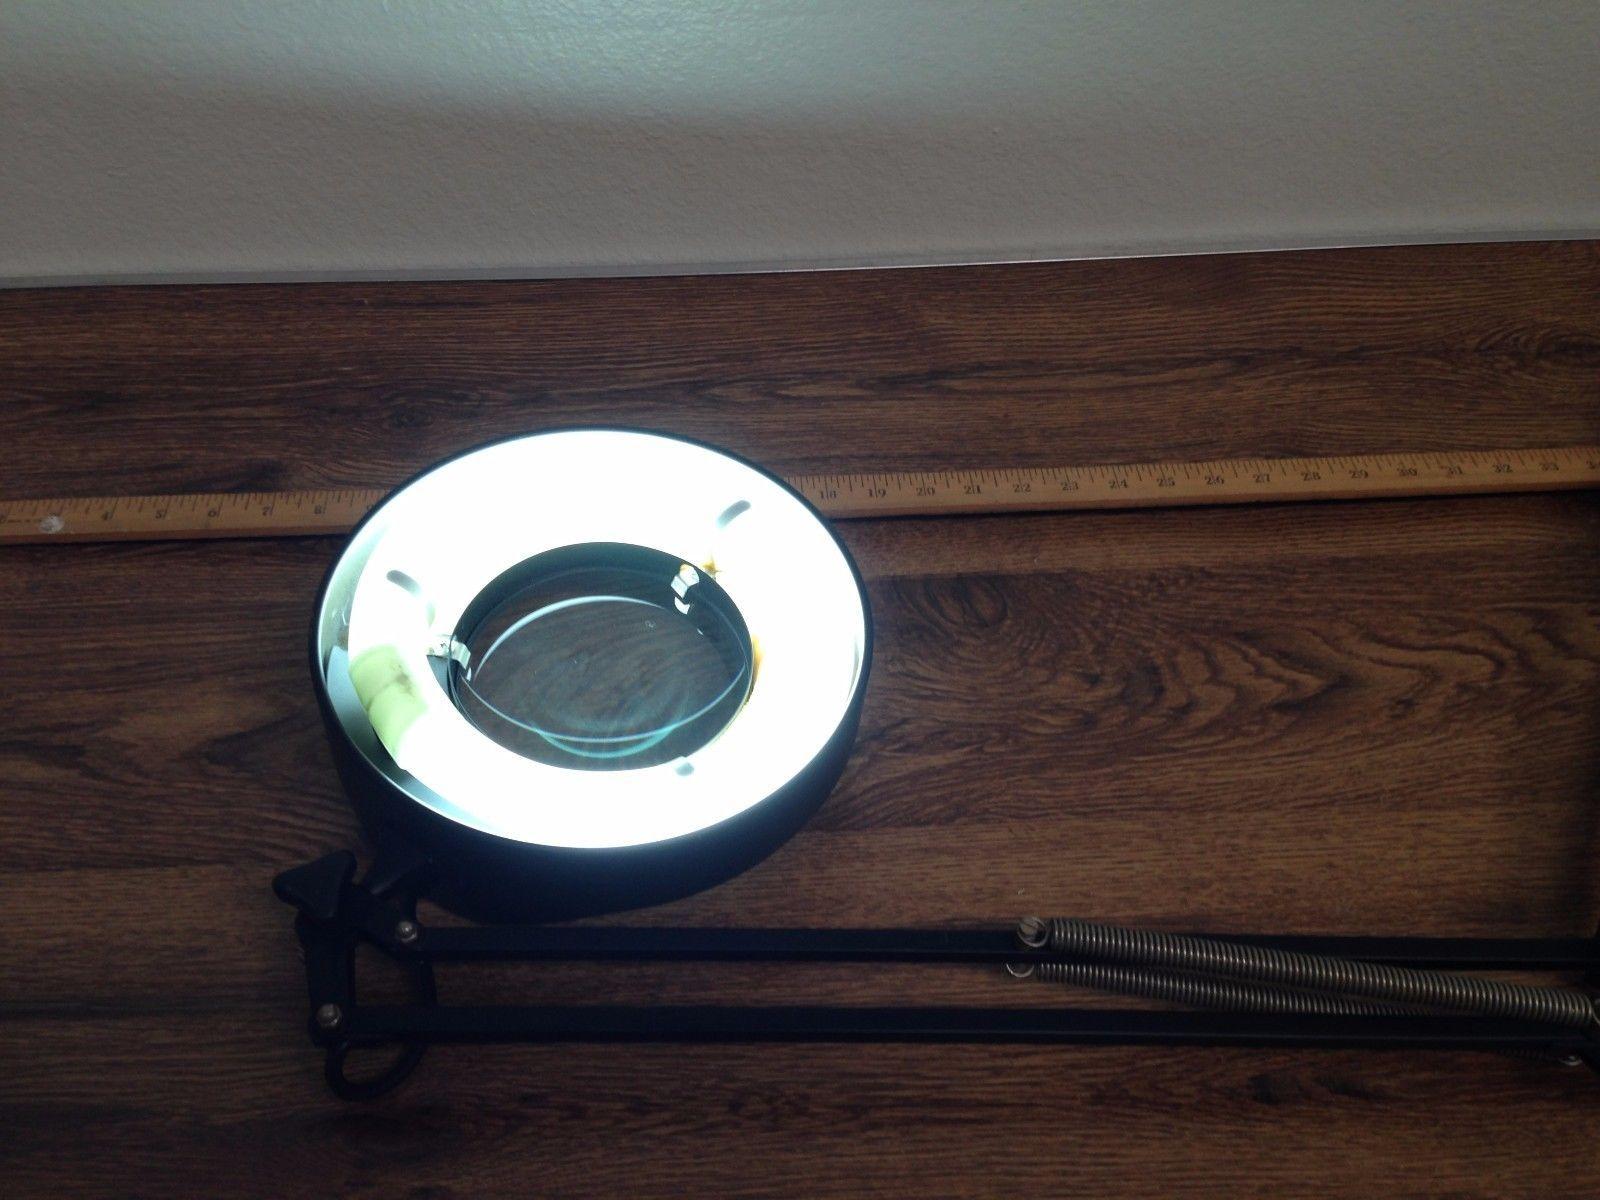 Vintage Portable Luminaire Round Magnifier Desk Lamp 120V 22W  Clamp Missing